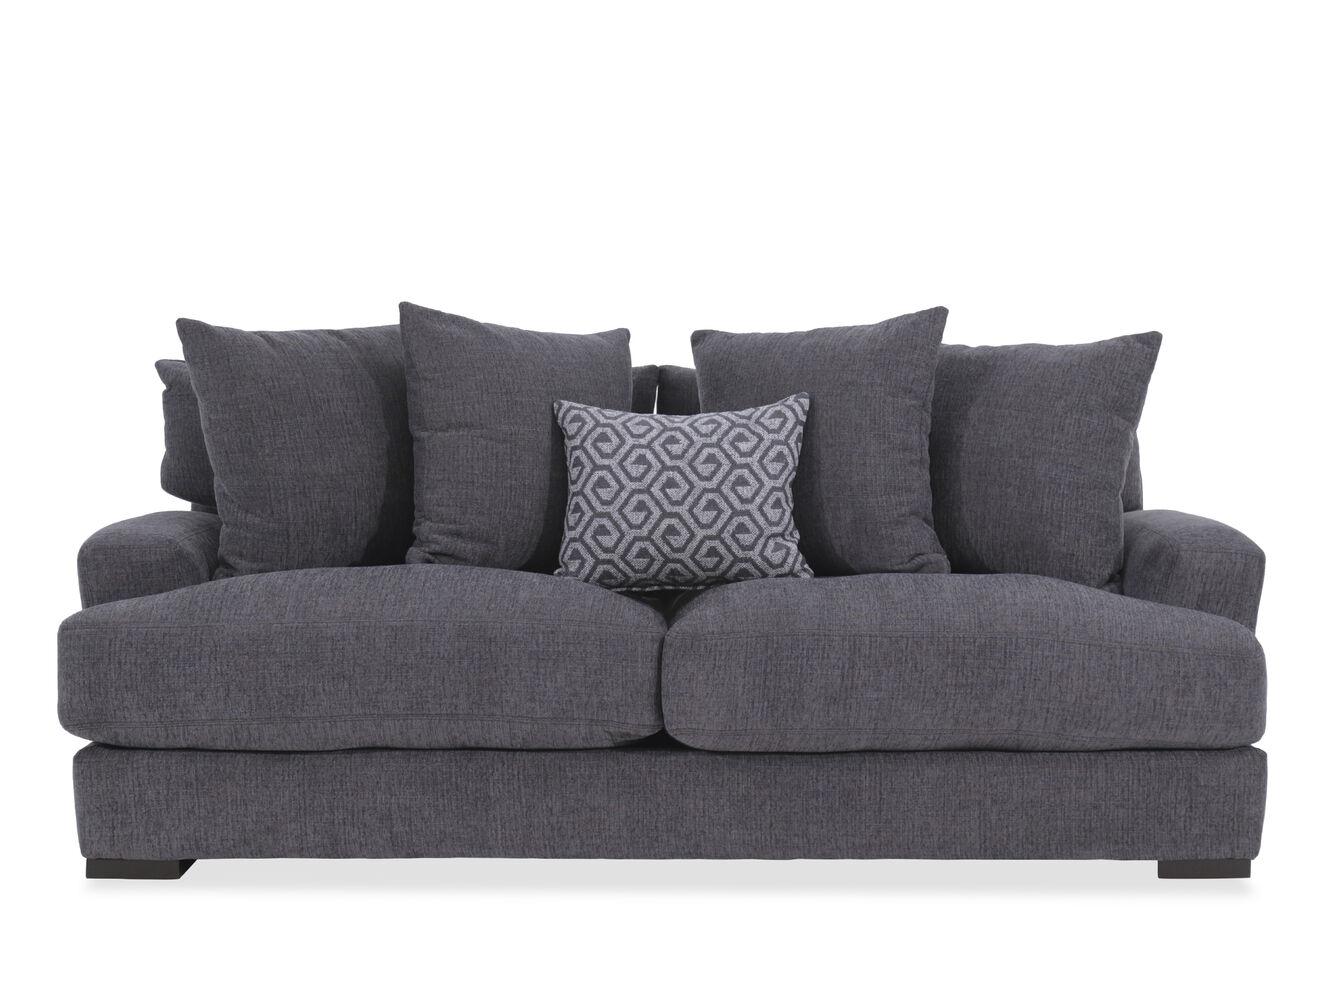 Jonathan Louis Carlin Sofa Mathis Brothers Furniture